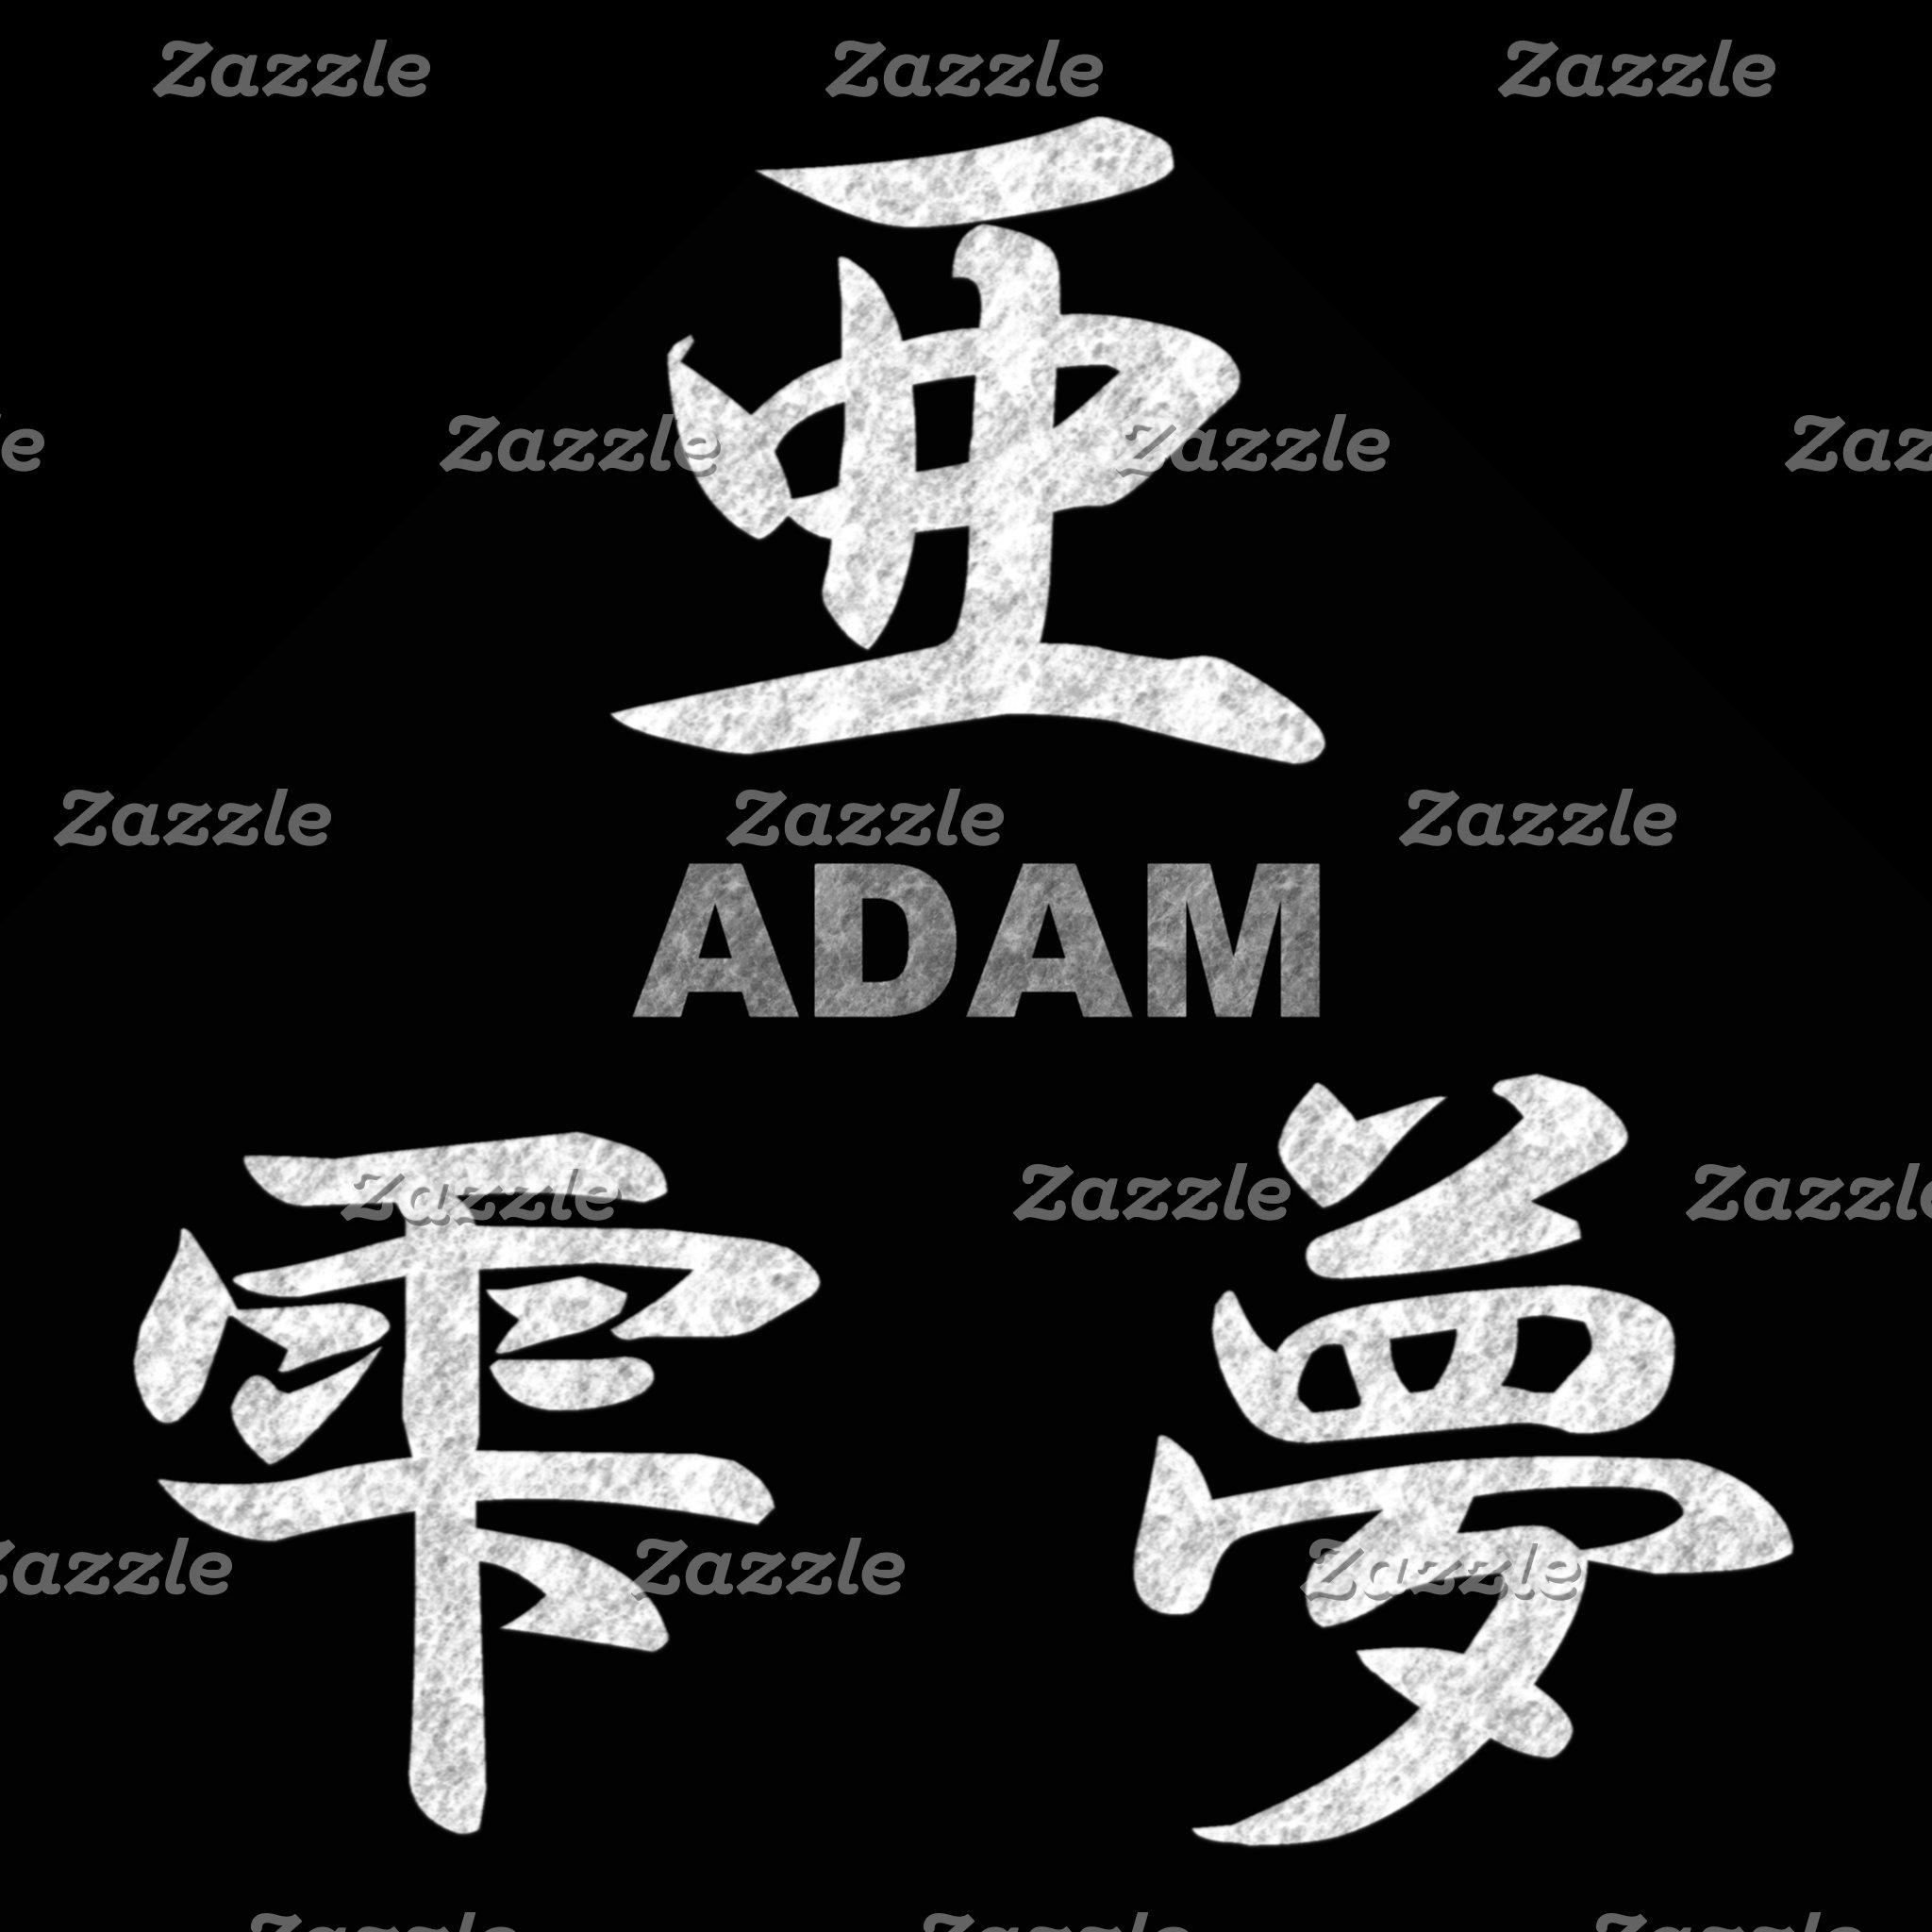 【漢字名前】 Name in Kanji ★★★